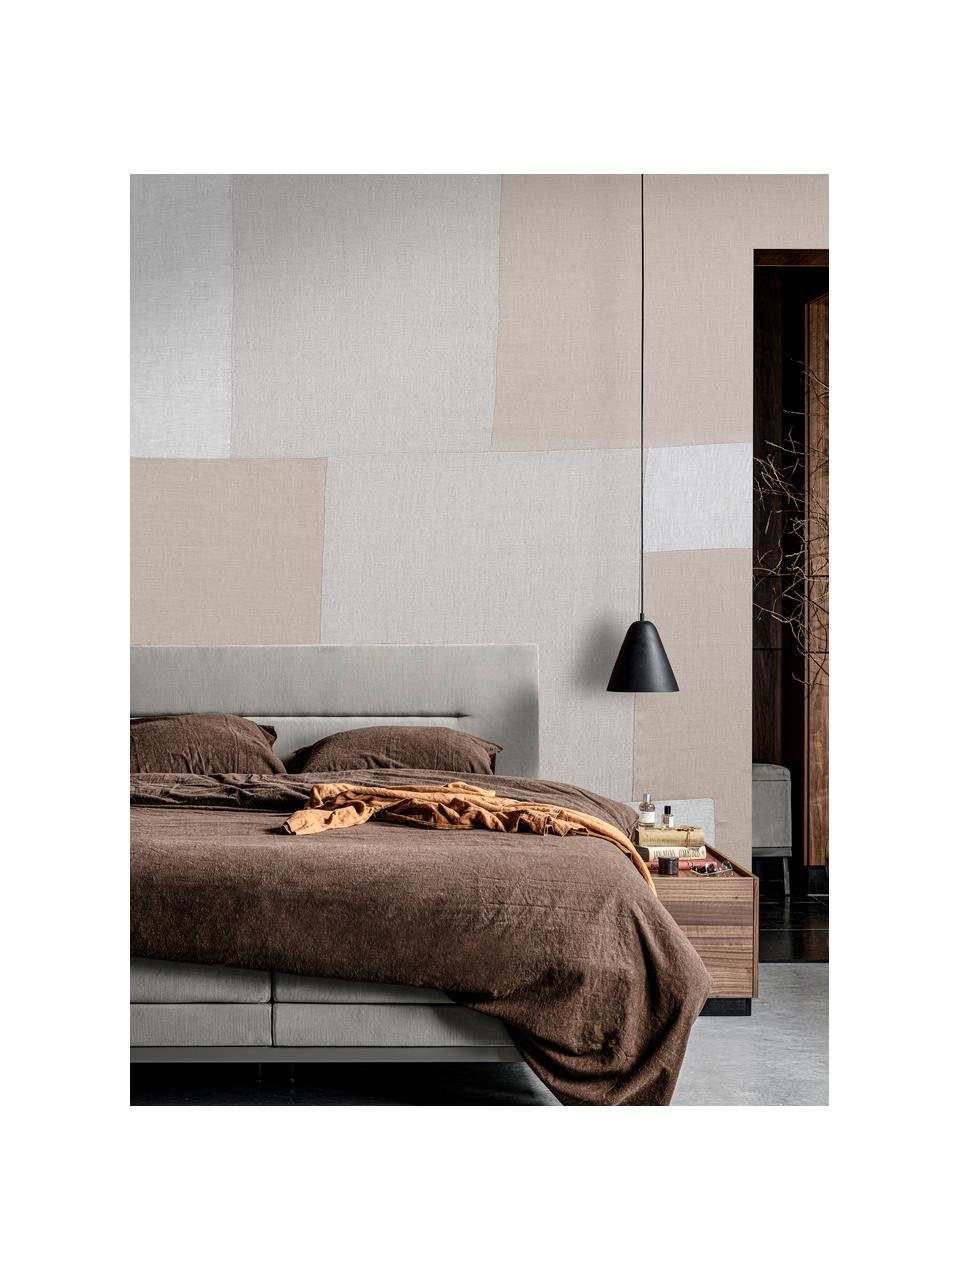 Adesivo murale Patchwork Beige, Tessuto non tessuto, Grigio chiaro, Larg. 300 x Alt. 280 cm